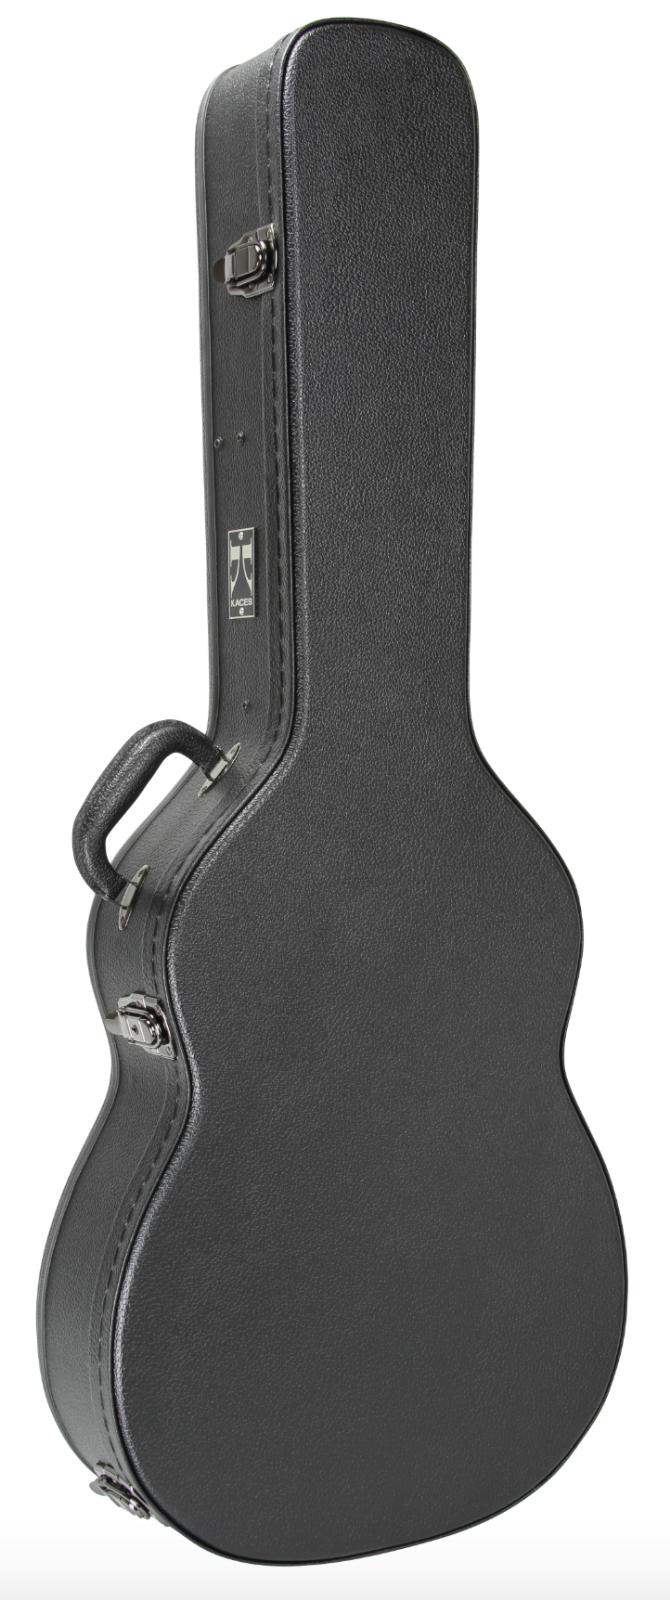 Kaces Hardshell Guitar Case - Classical Guitar KHC-FT1